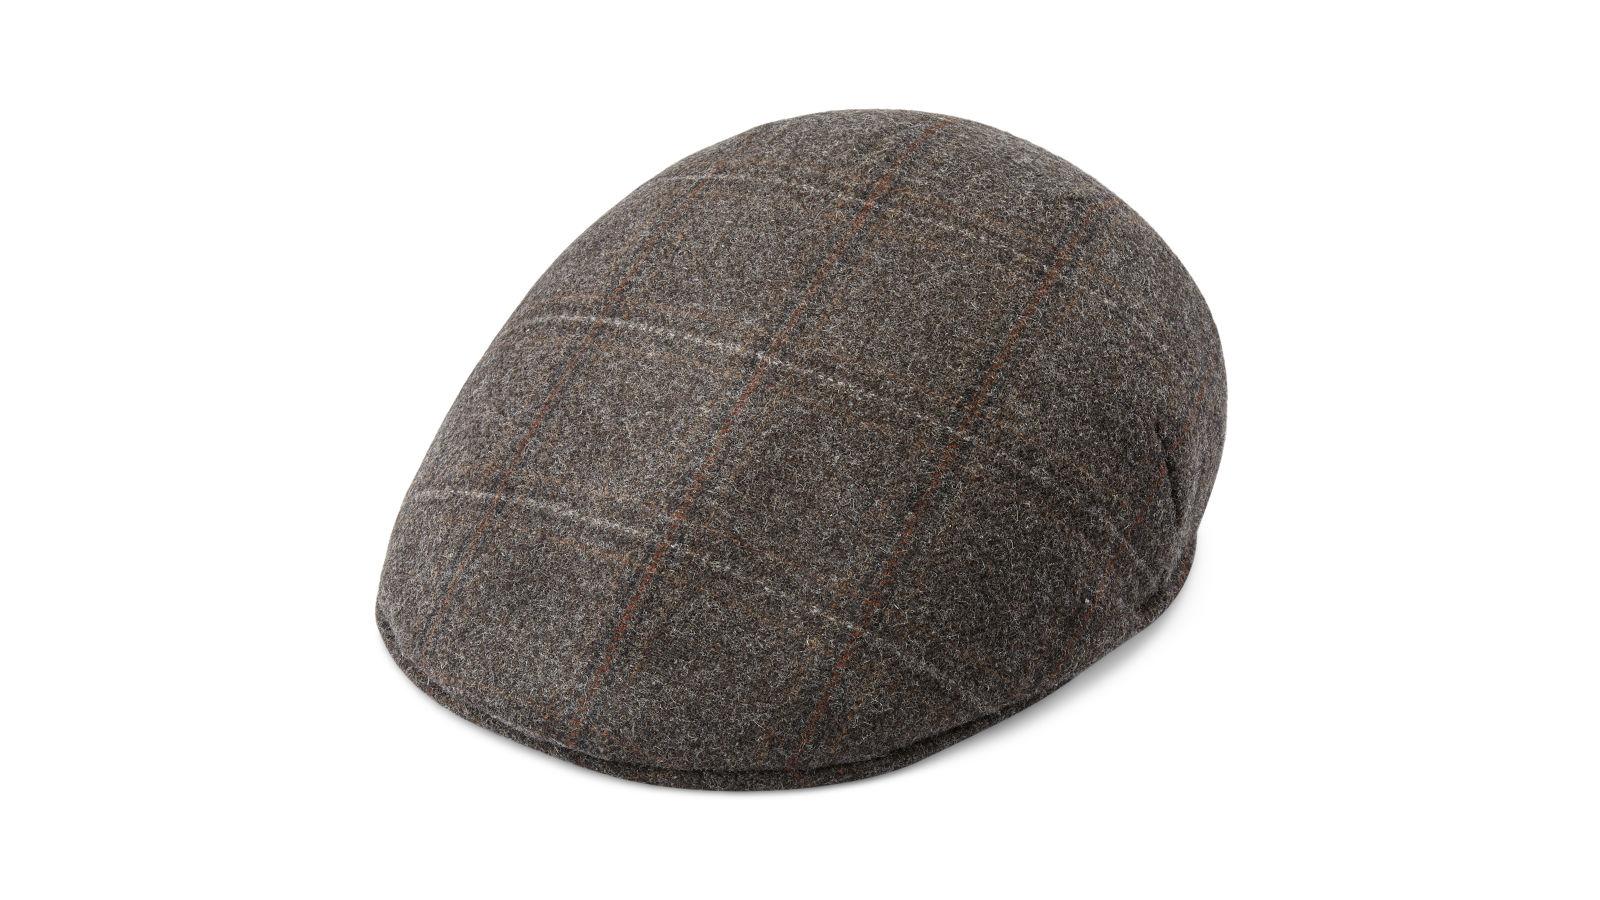 Gorra plana de lana gris Fido Country  44b32b0f714